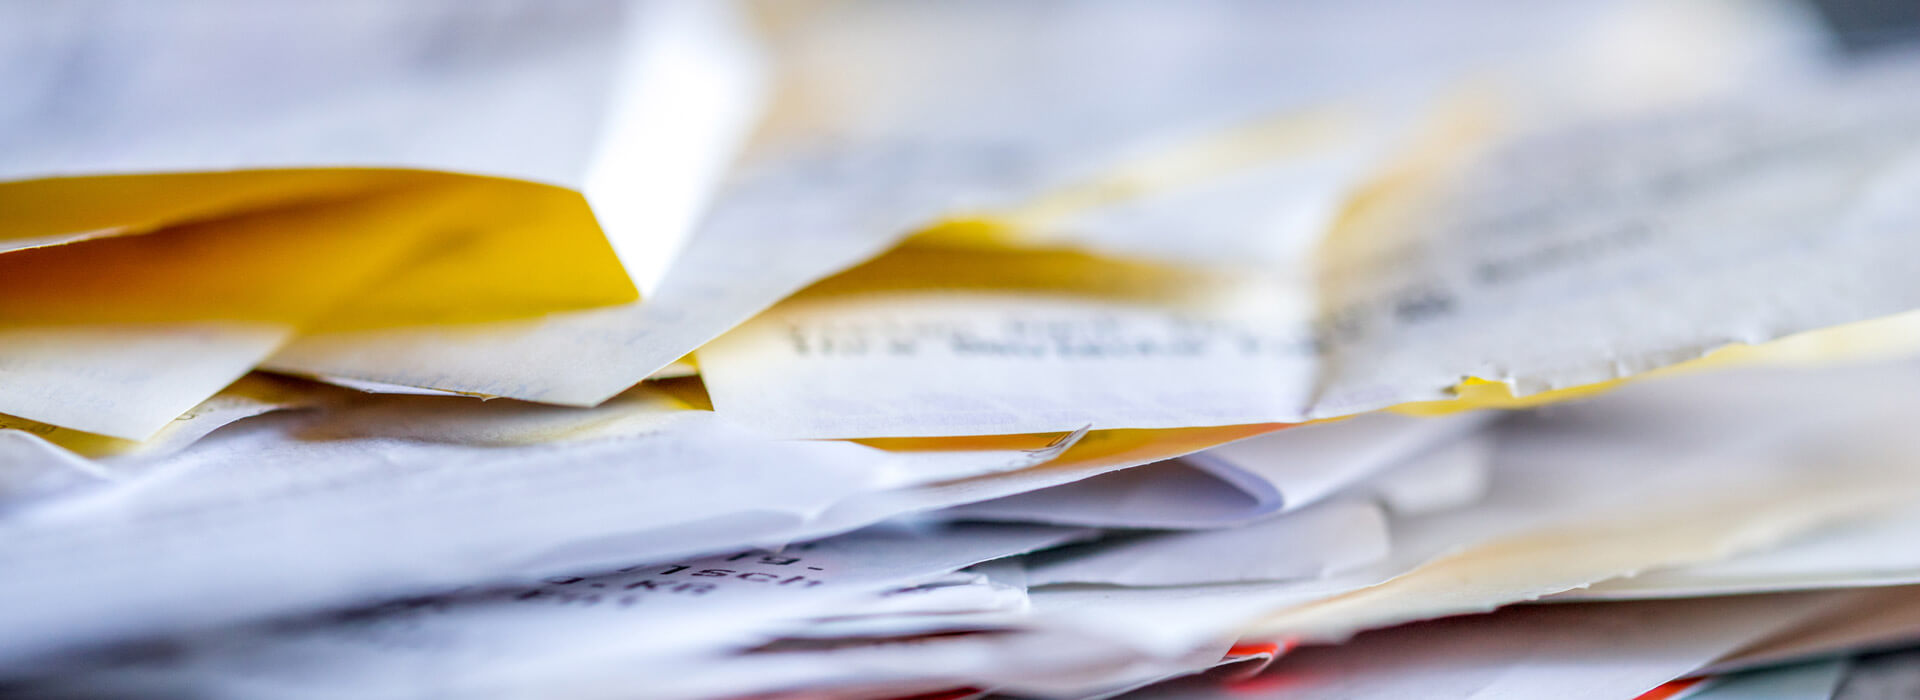 Stapel envelopen brieven ingezoomd